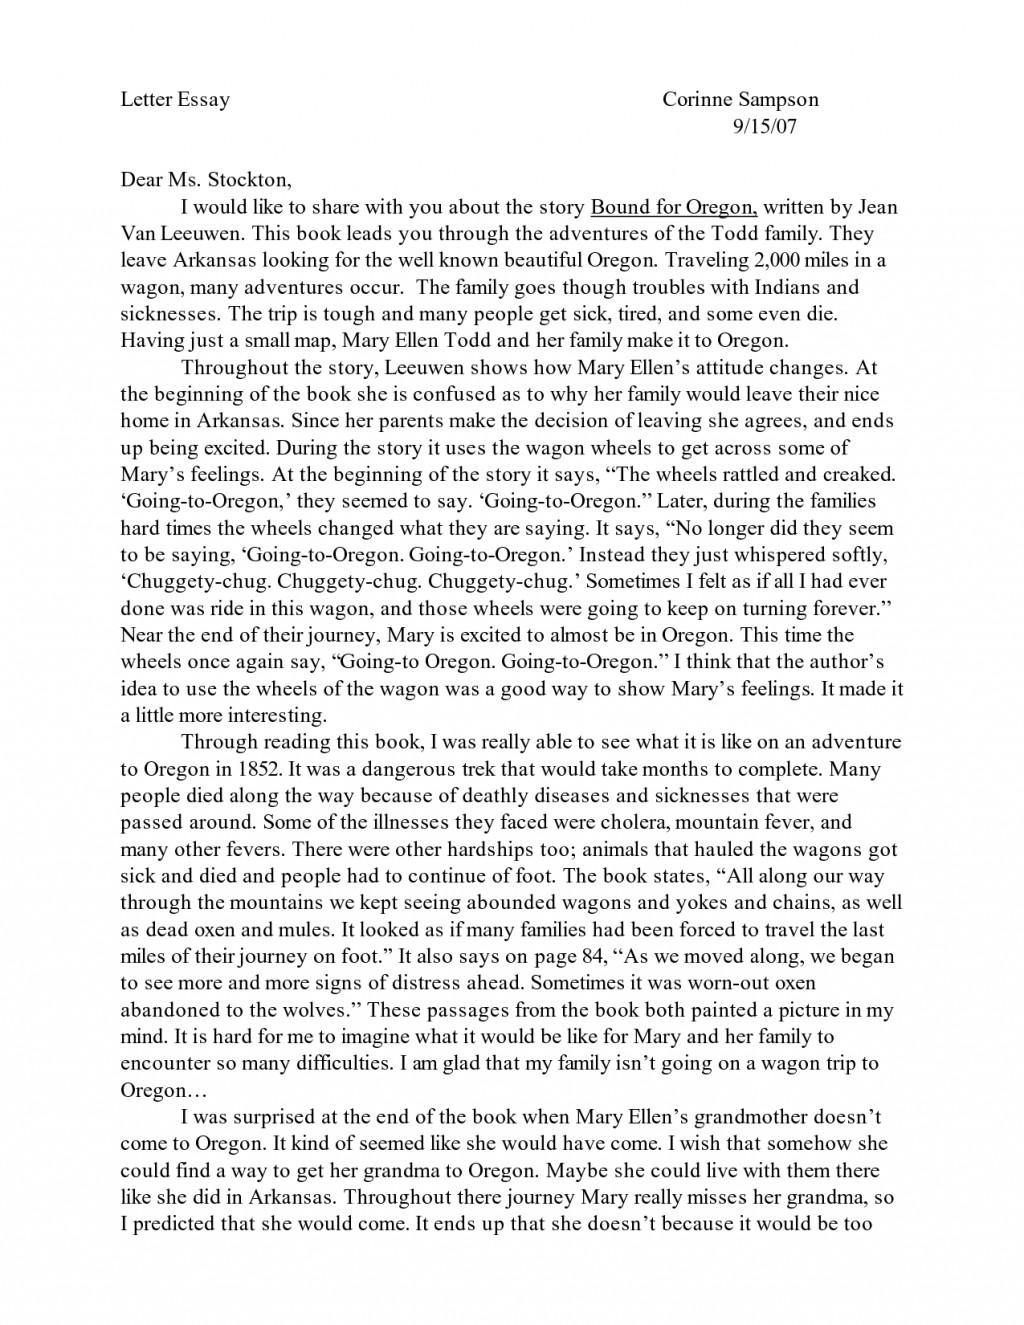 003 Sample Essay For Scholarship Incredible Mara Personal Pdf Large